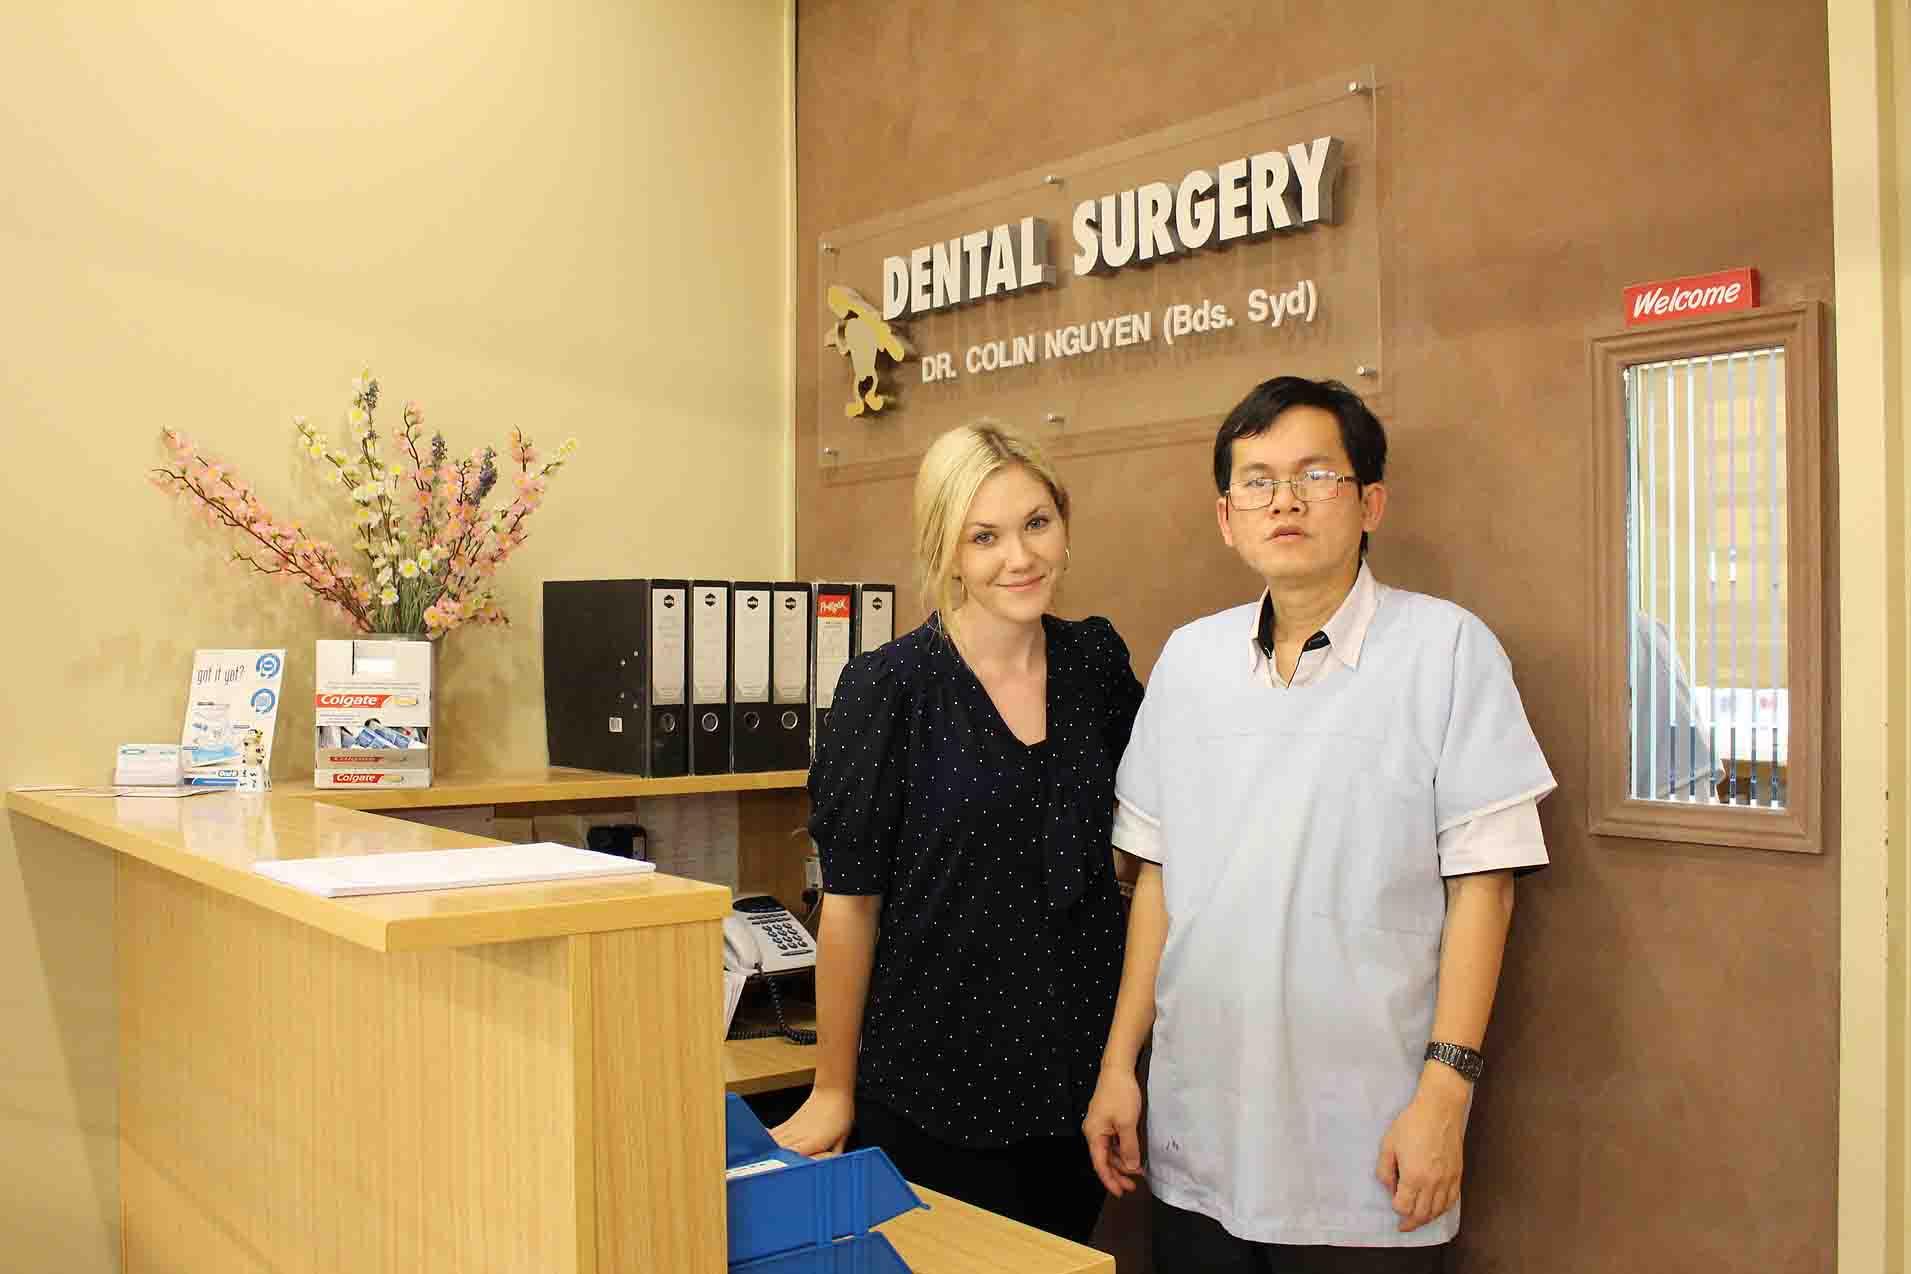 kellyville dental employees